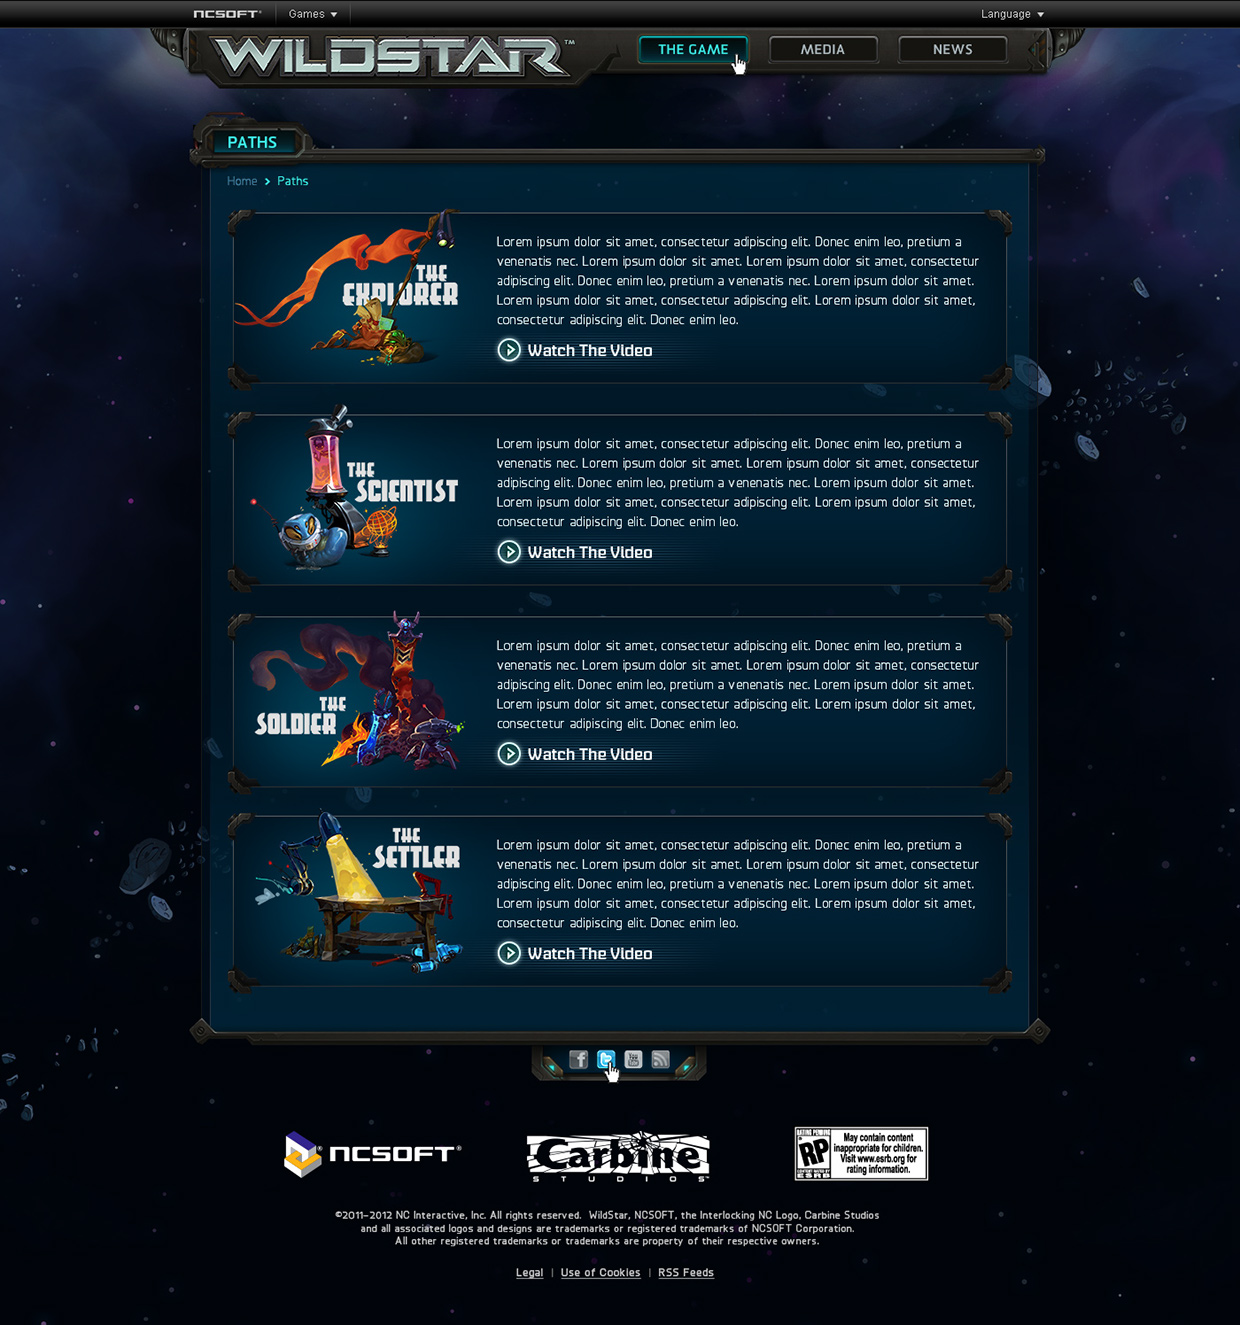 wildstar_web_10_pathsoverview.jpg